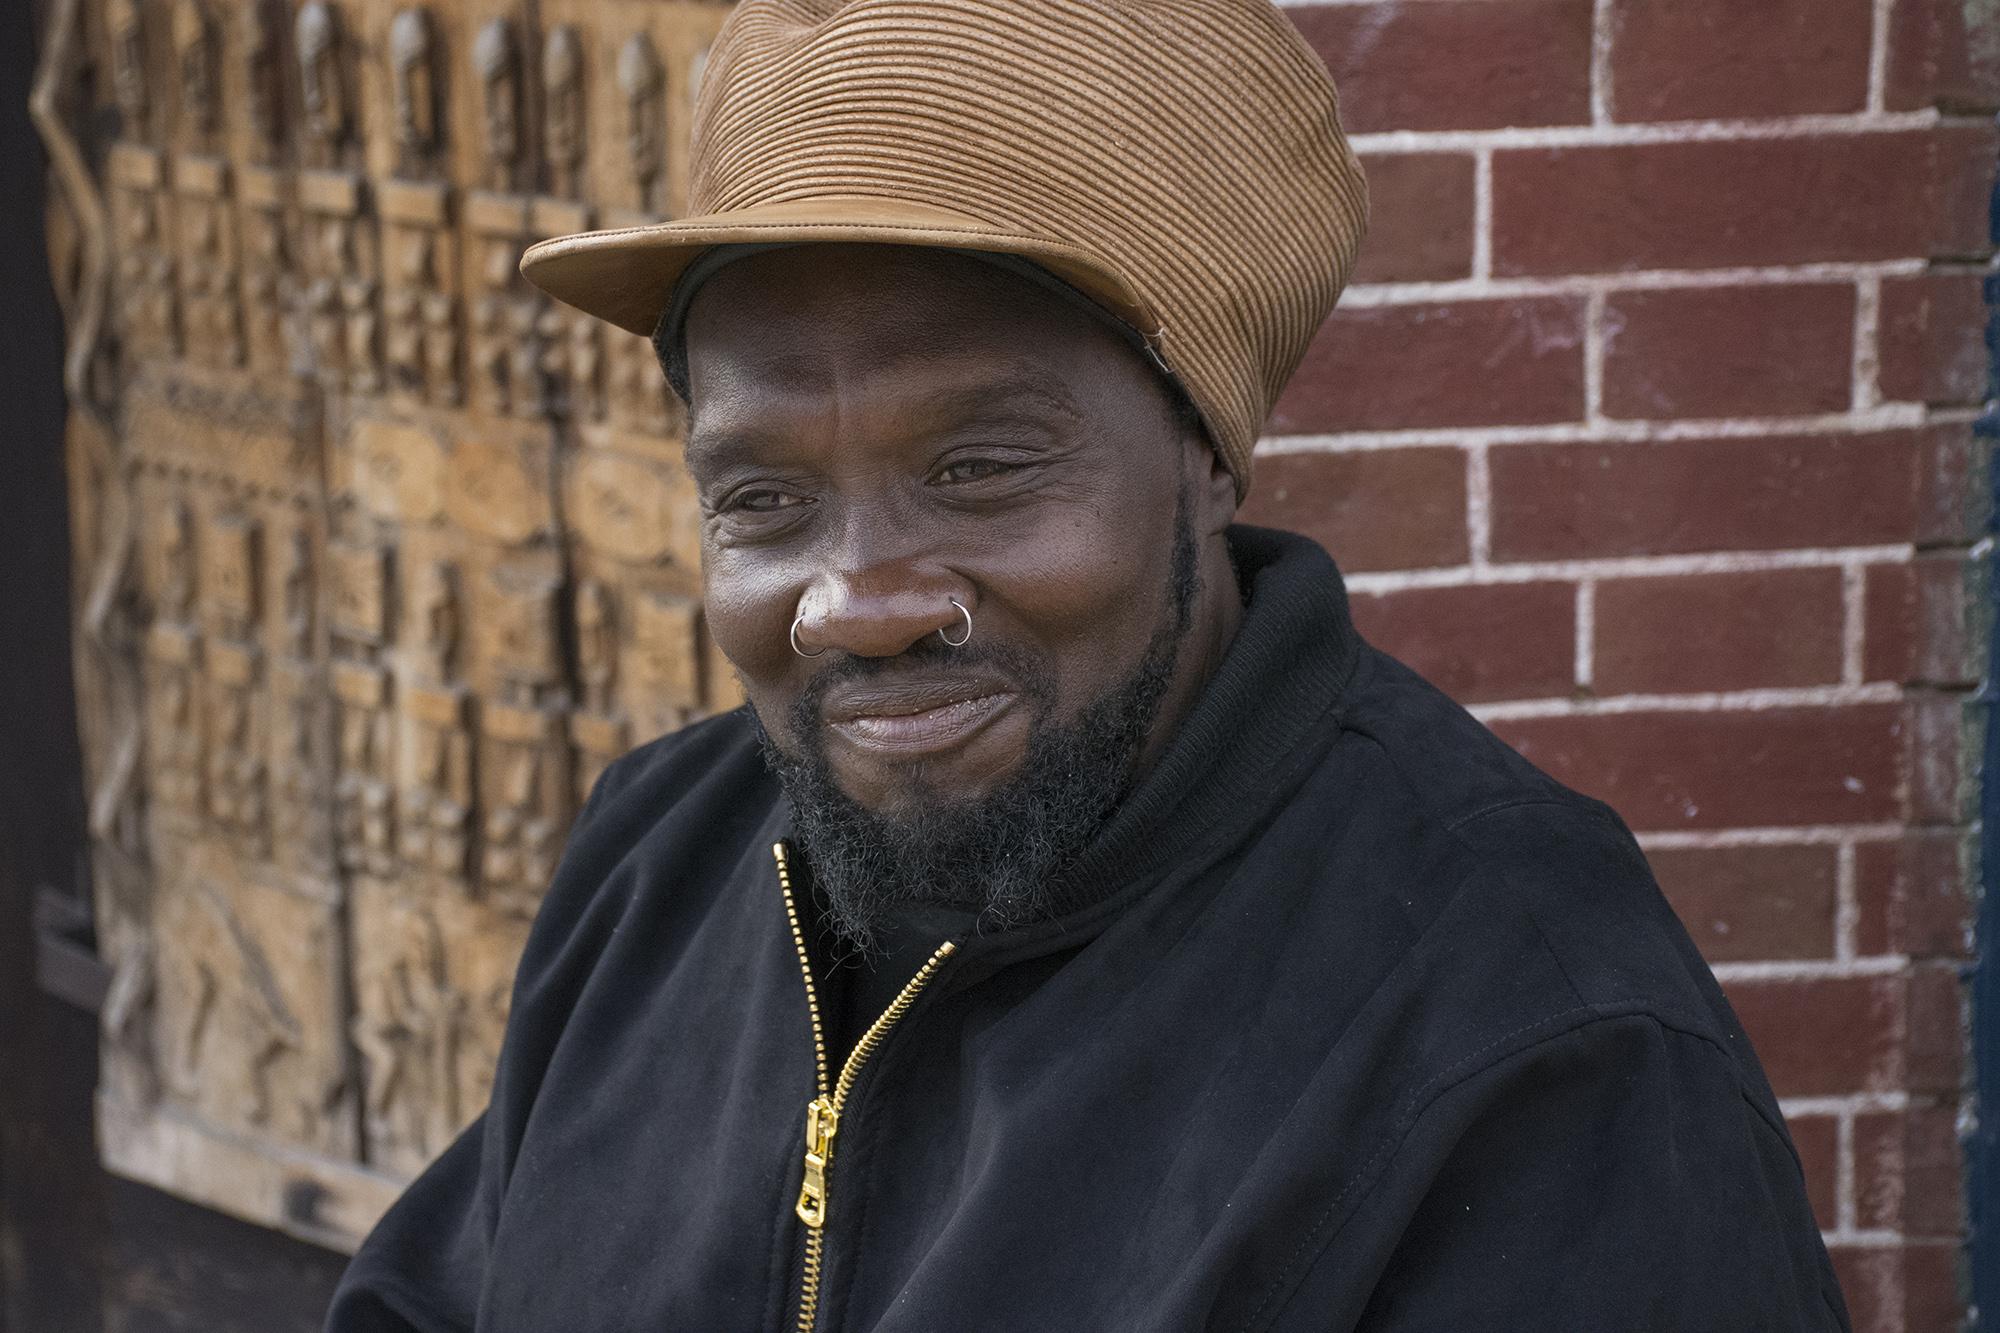 In the Hollins Market Neighborhood, Robert Williams is known as African Robert.